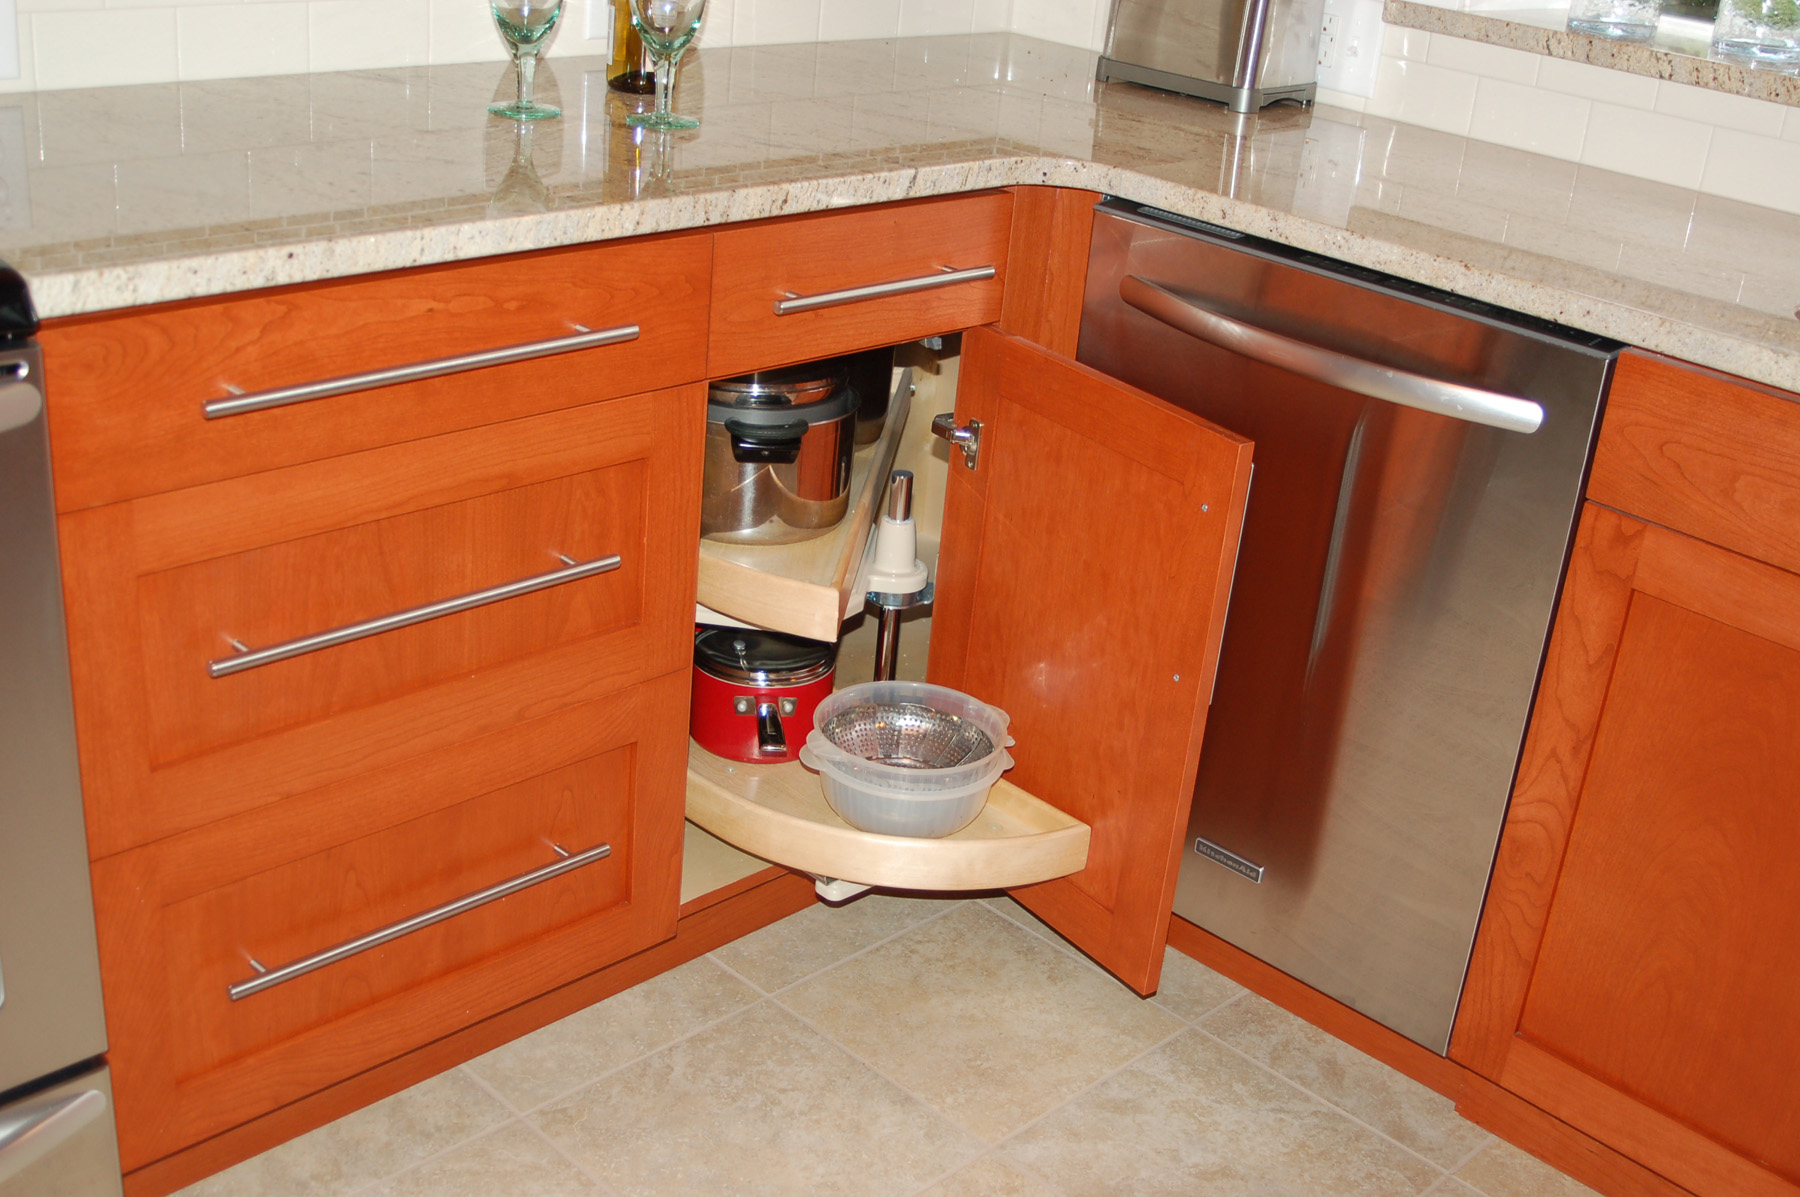 corner cabinet design traditional kitchen cabinets kitchen sink cabinets Kitchen Cabinet